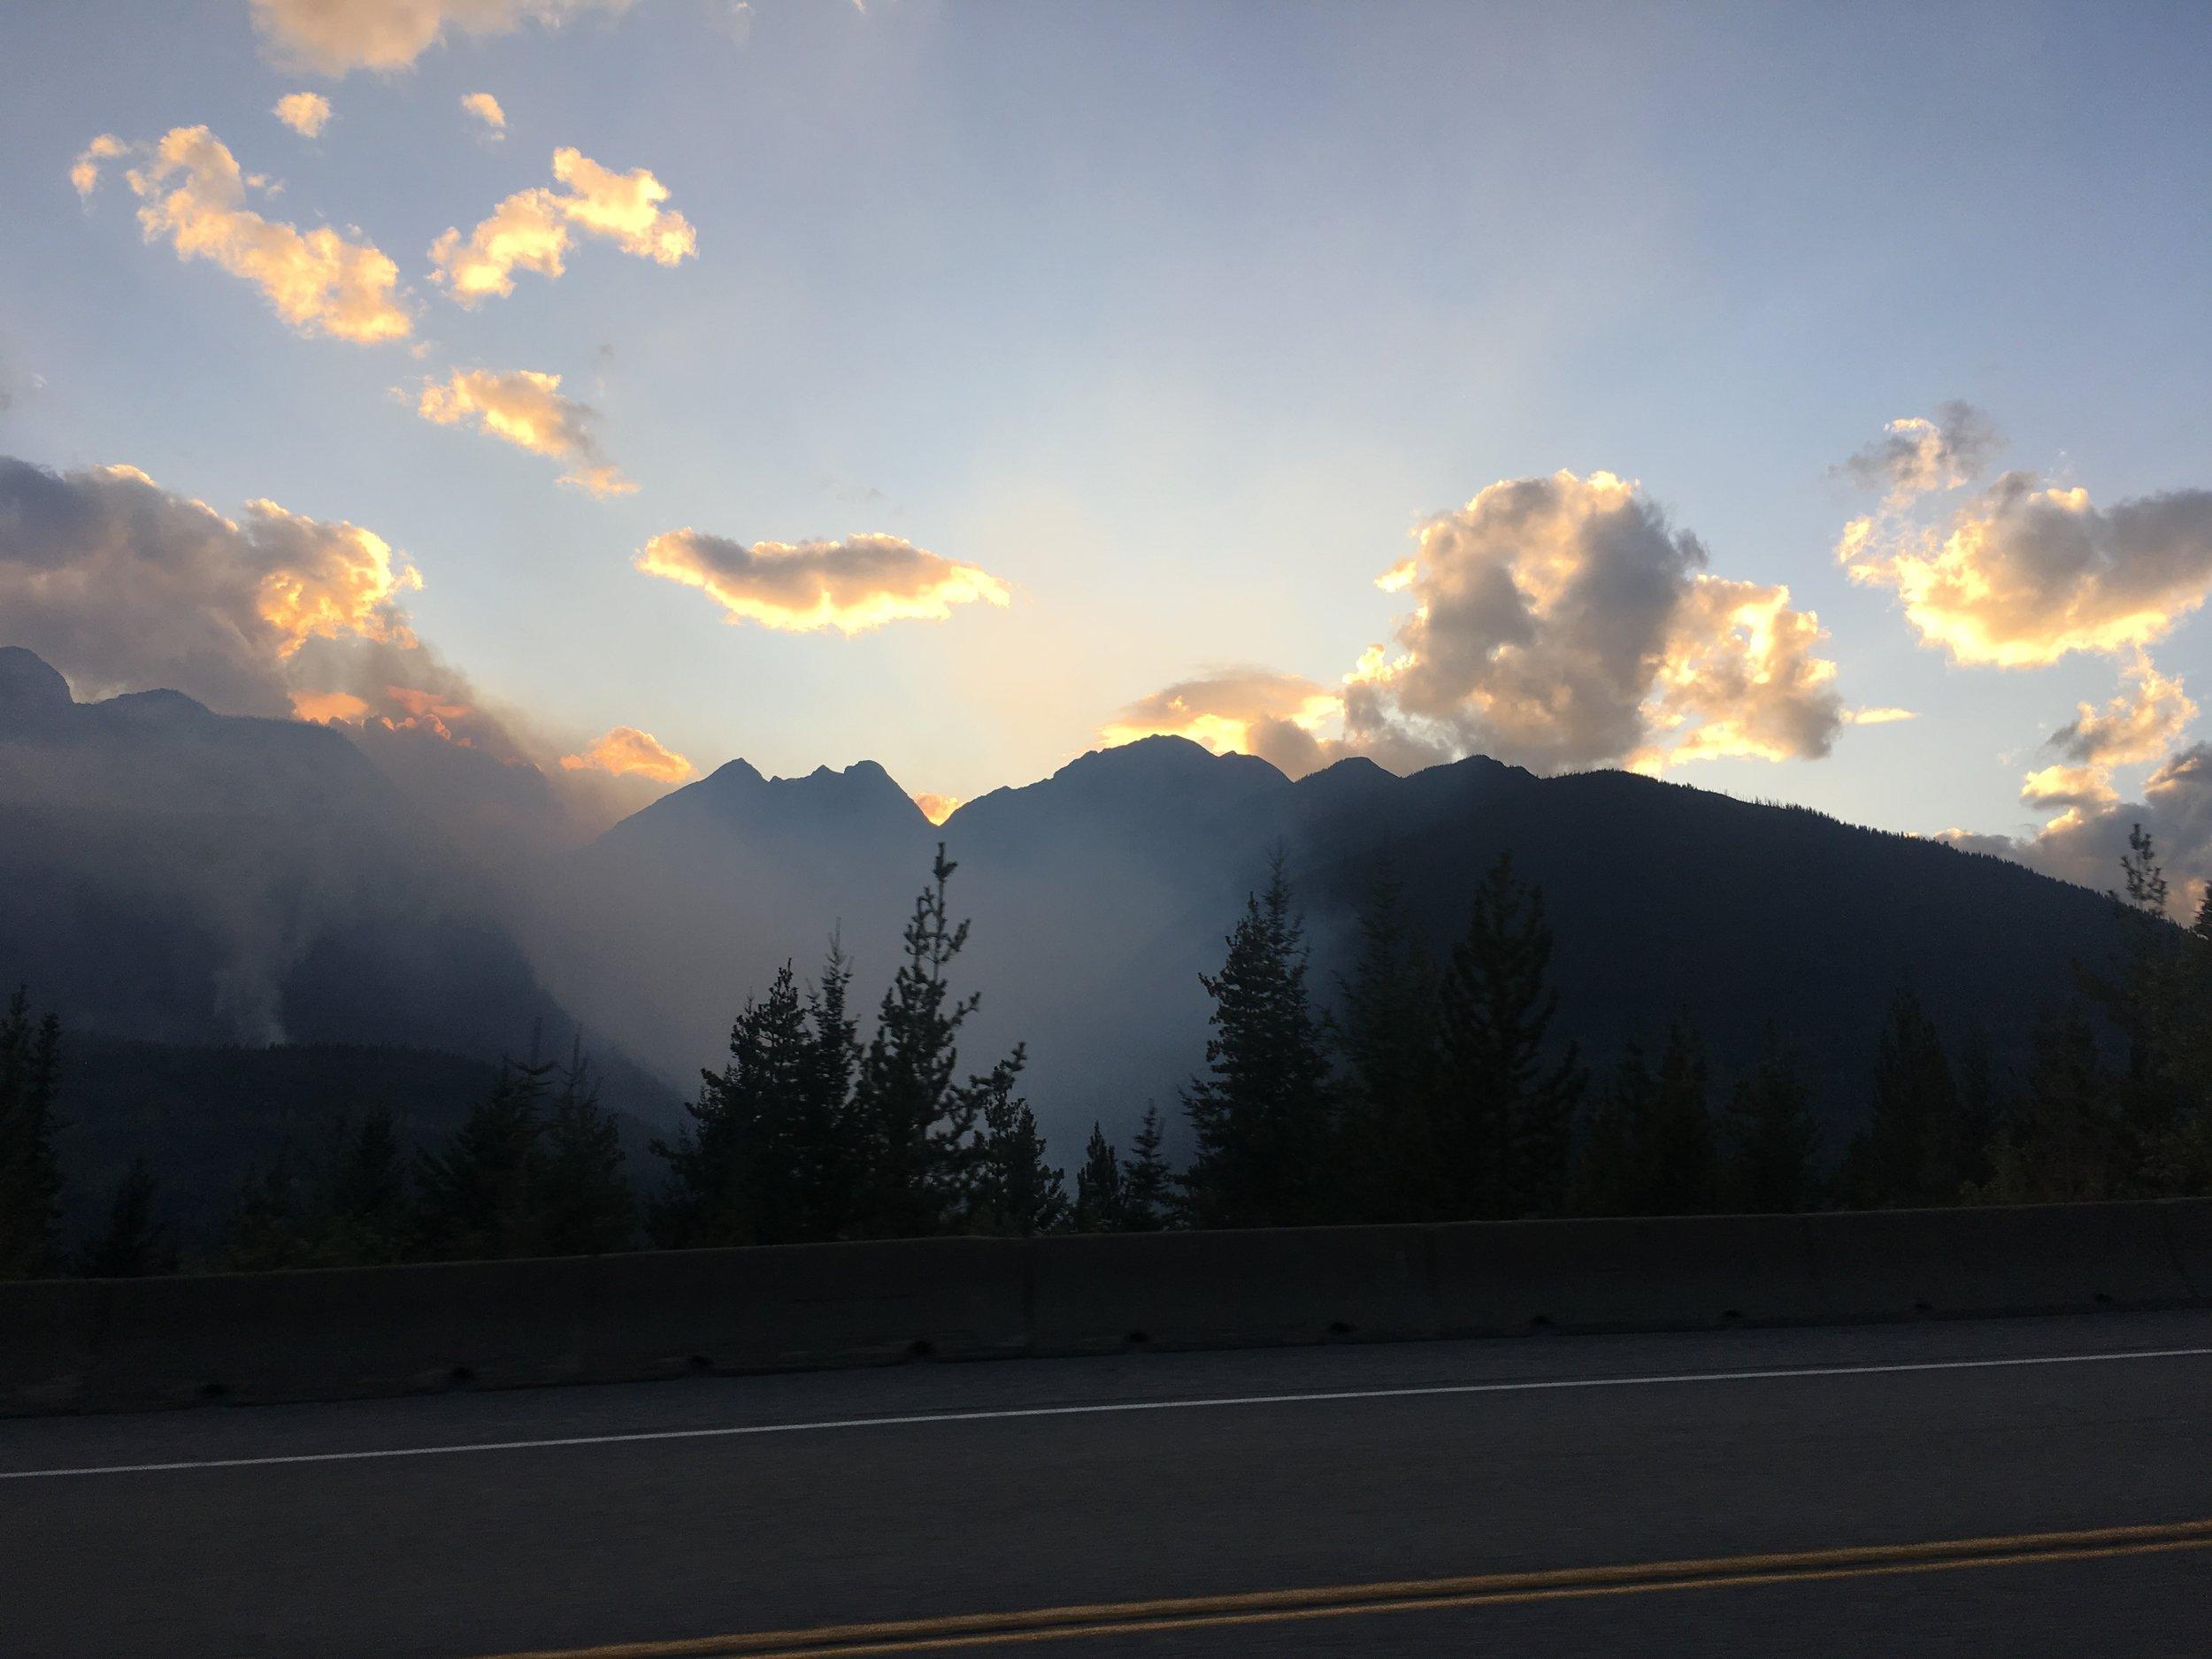 Wildfires in Glacier National Park (British Columbia)